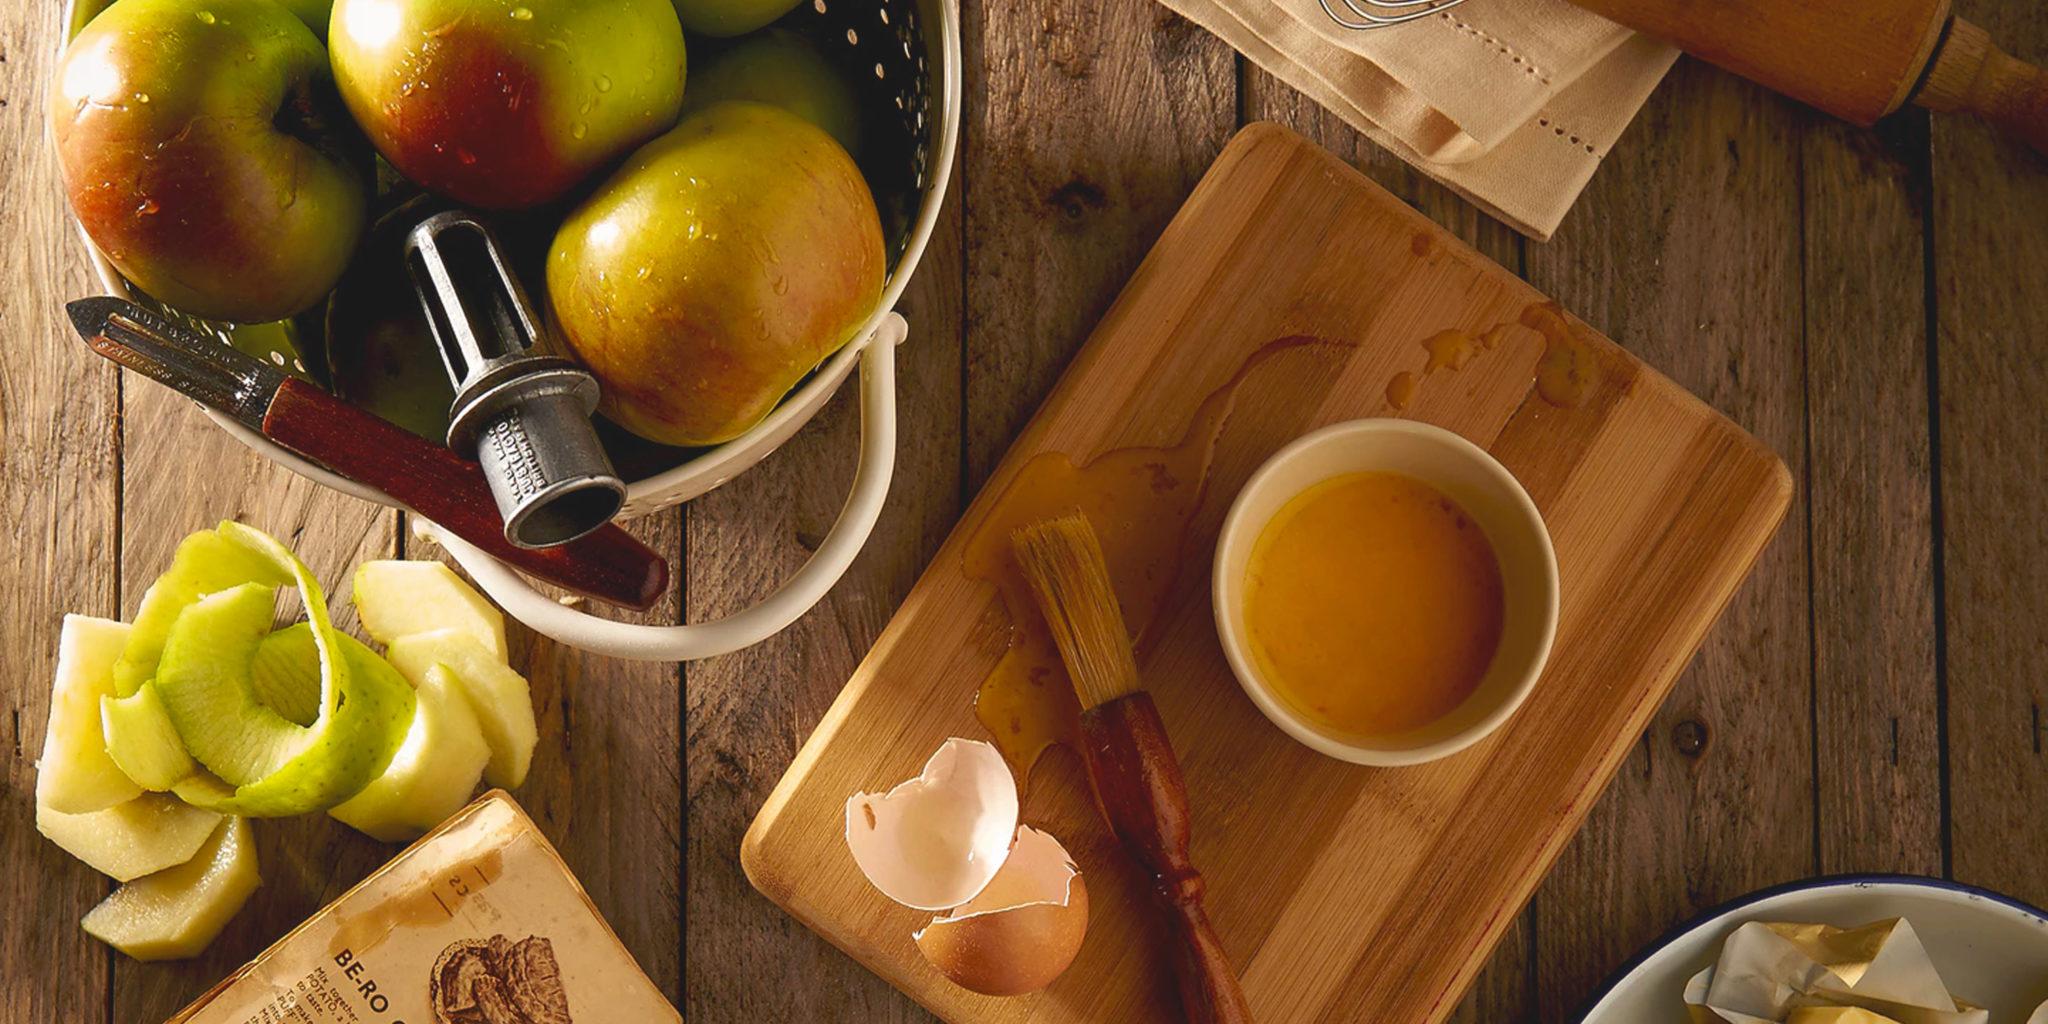 image4 2 - 【レビュー】大人のおやつVaporFi by Cosmic Fog「Grandma's Dutch Apple Pie(グランマズ ダッチ アップルパイ)」~上品なフレーバーに舌鼓を打ち鳴らせ!!~